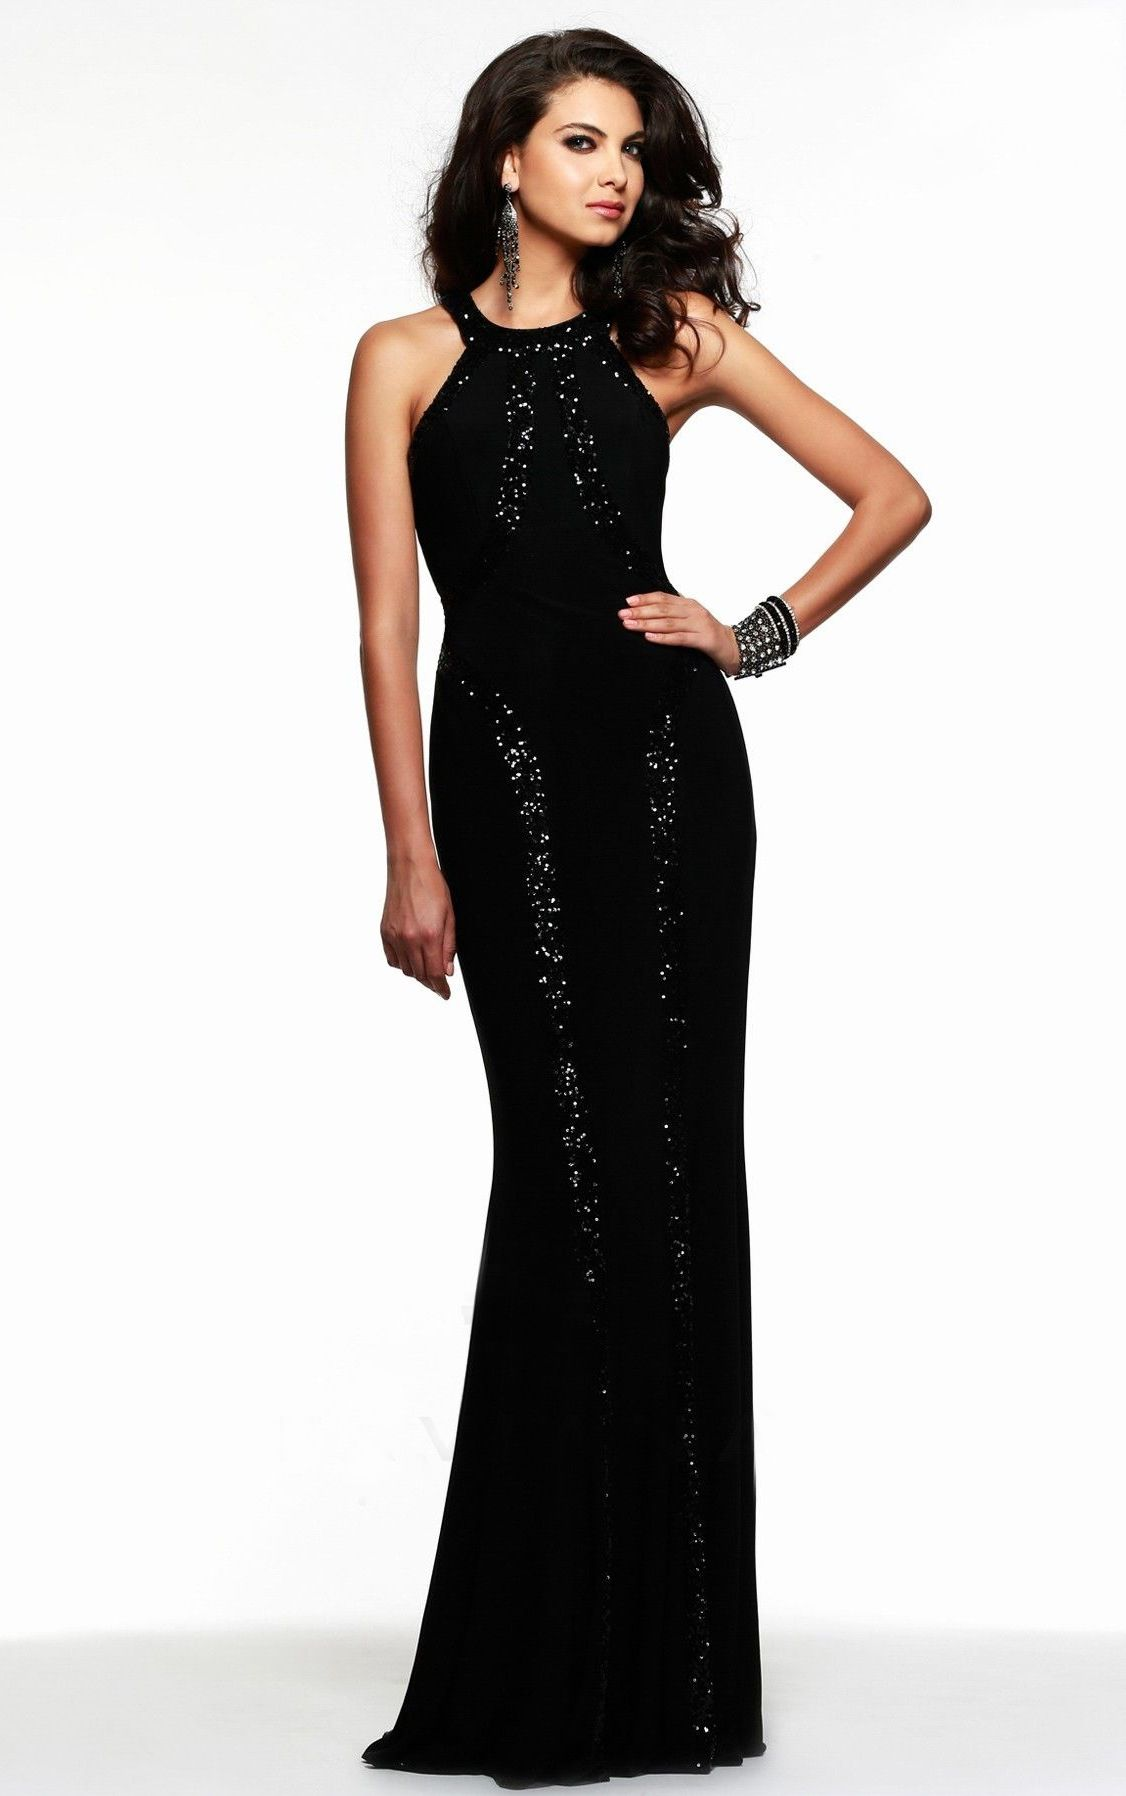 Pictures gece elbise modelleri 2013 uzun dekolteli gece elbise modeli - Siyah Uzun Abiye Modelleri Gece Elbiseleri 17